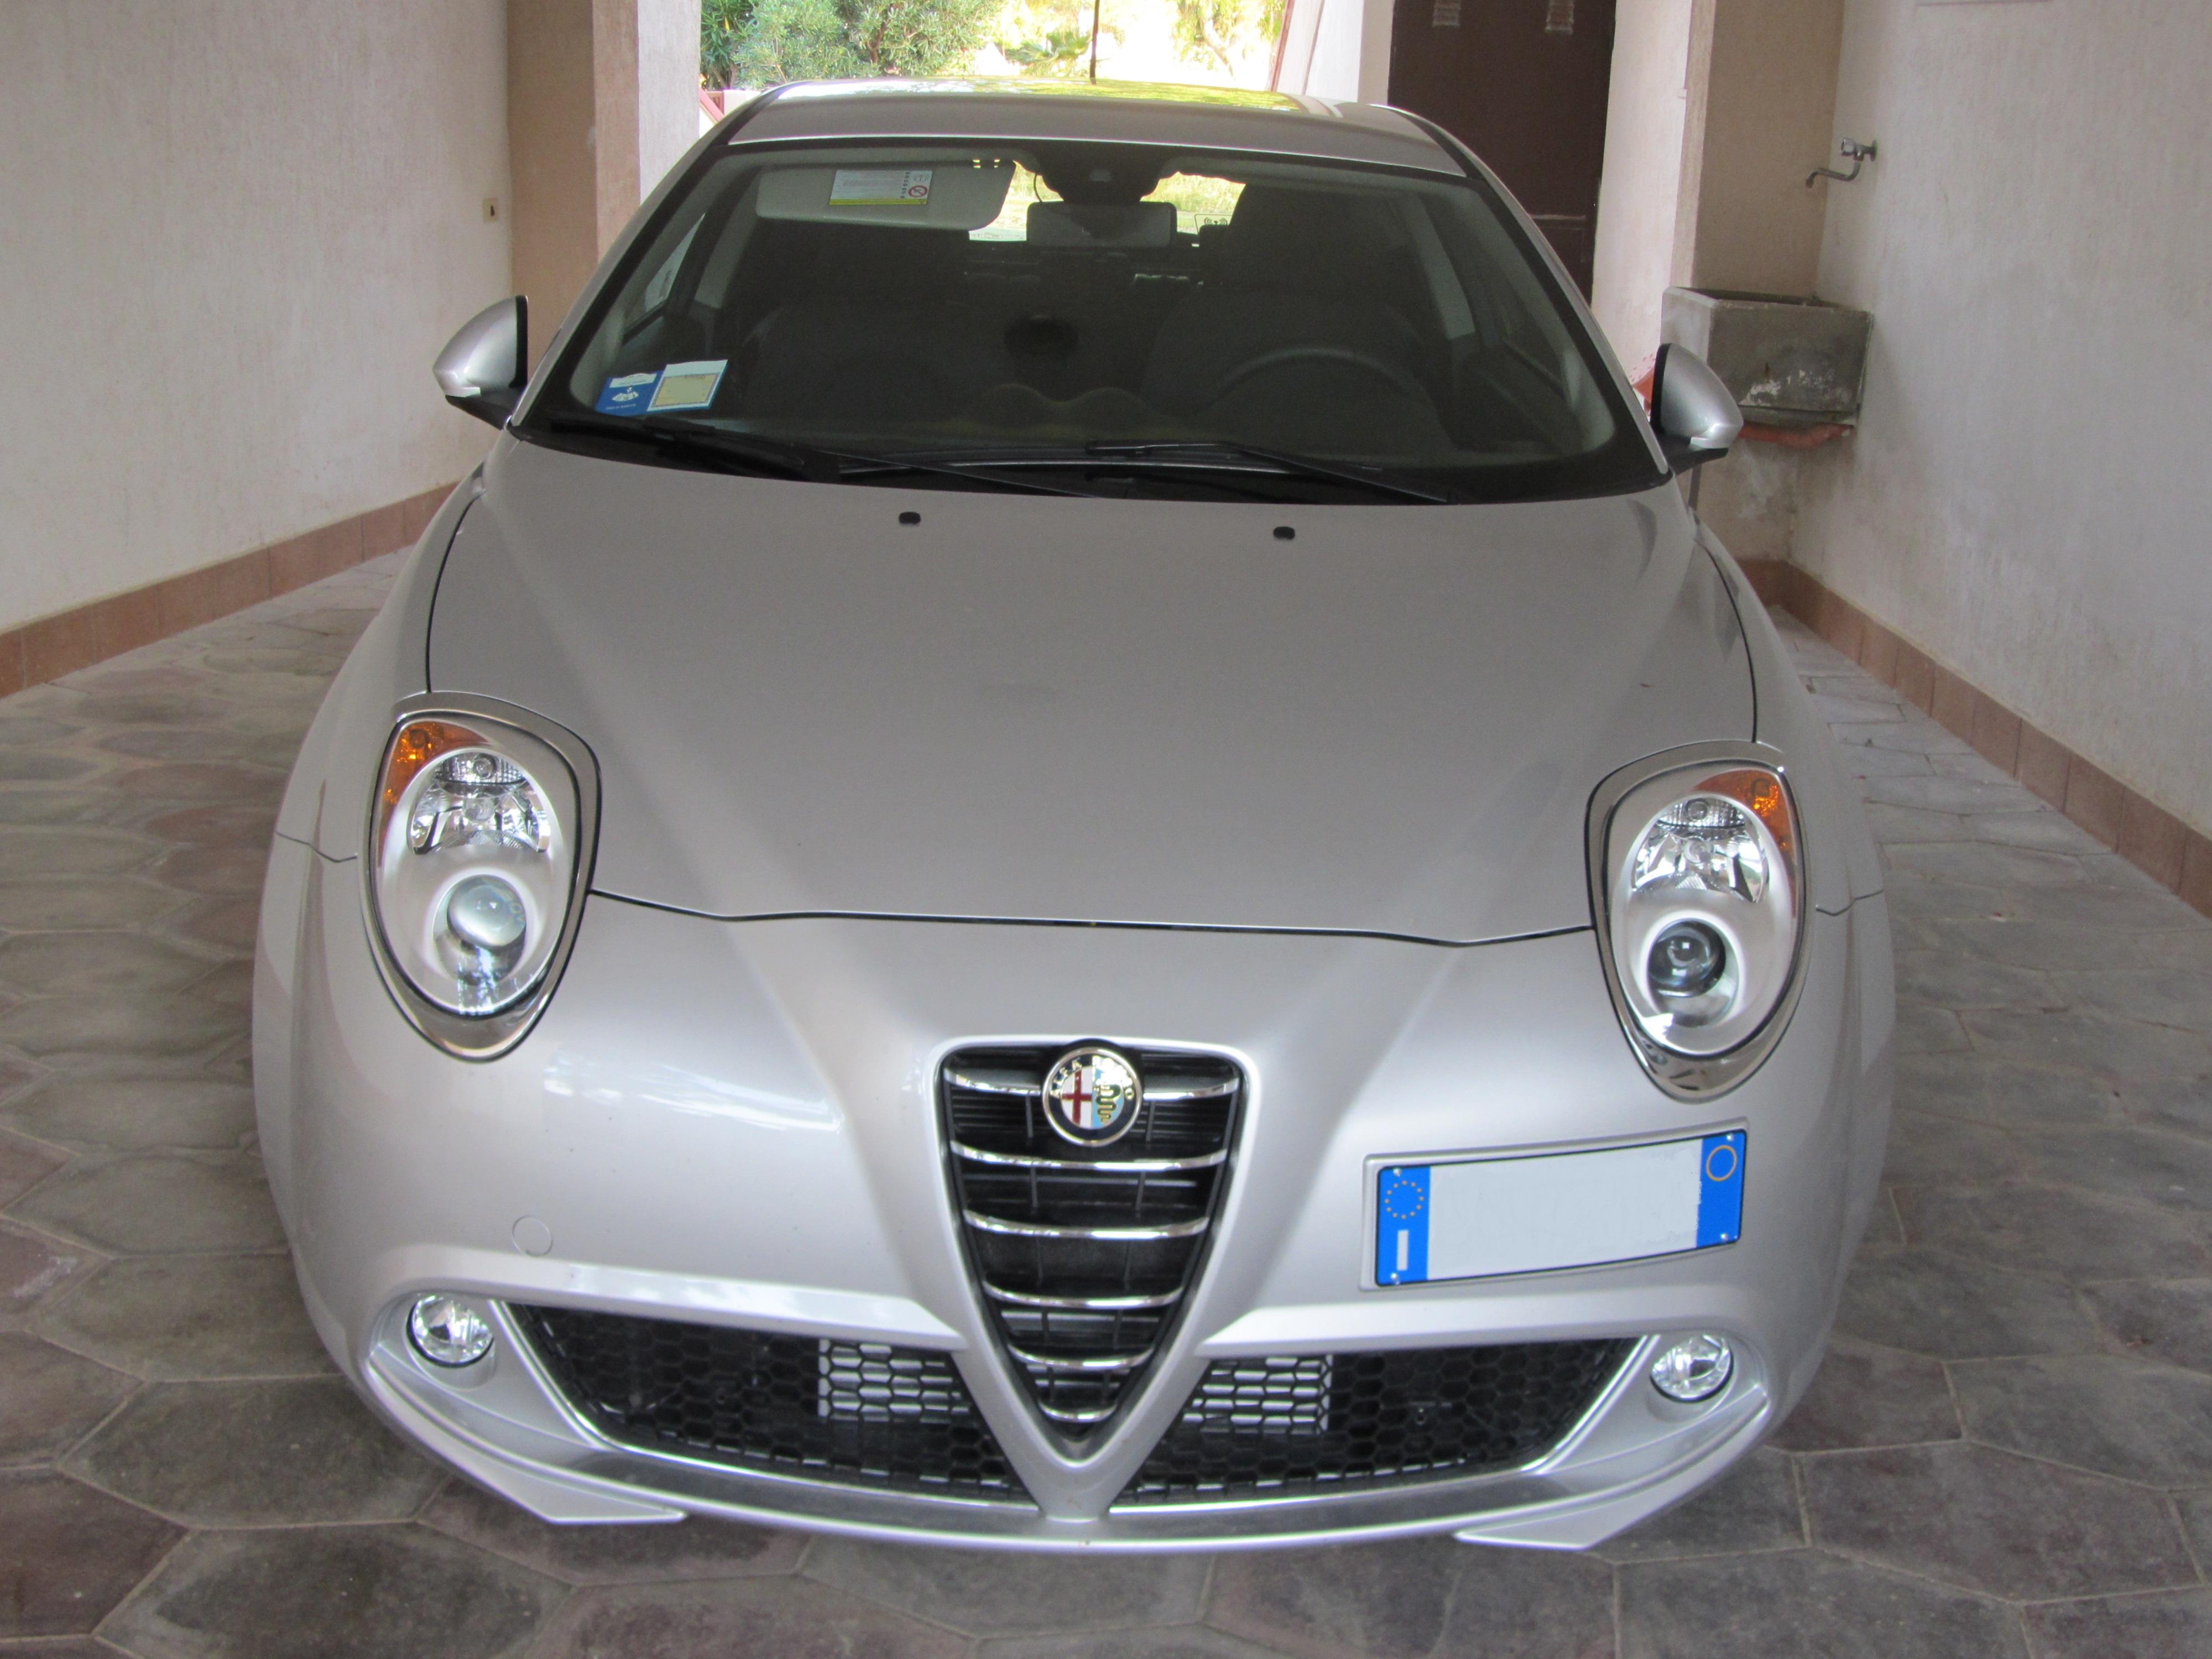 "file:"" 12 - italy - alfa romeo mito grey hatchback coupé 08"